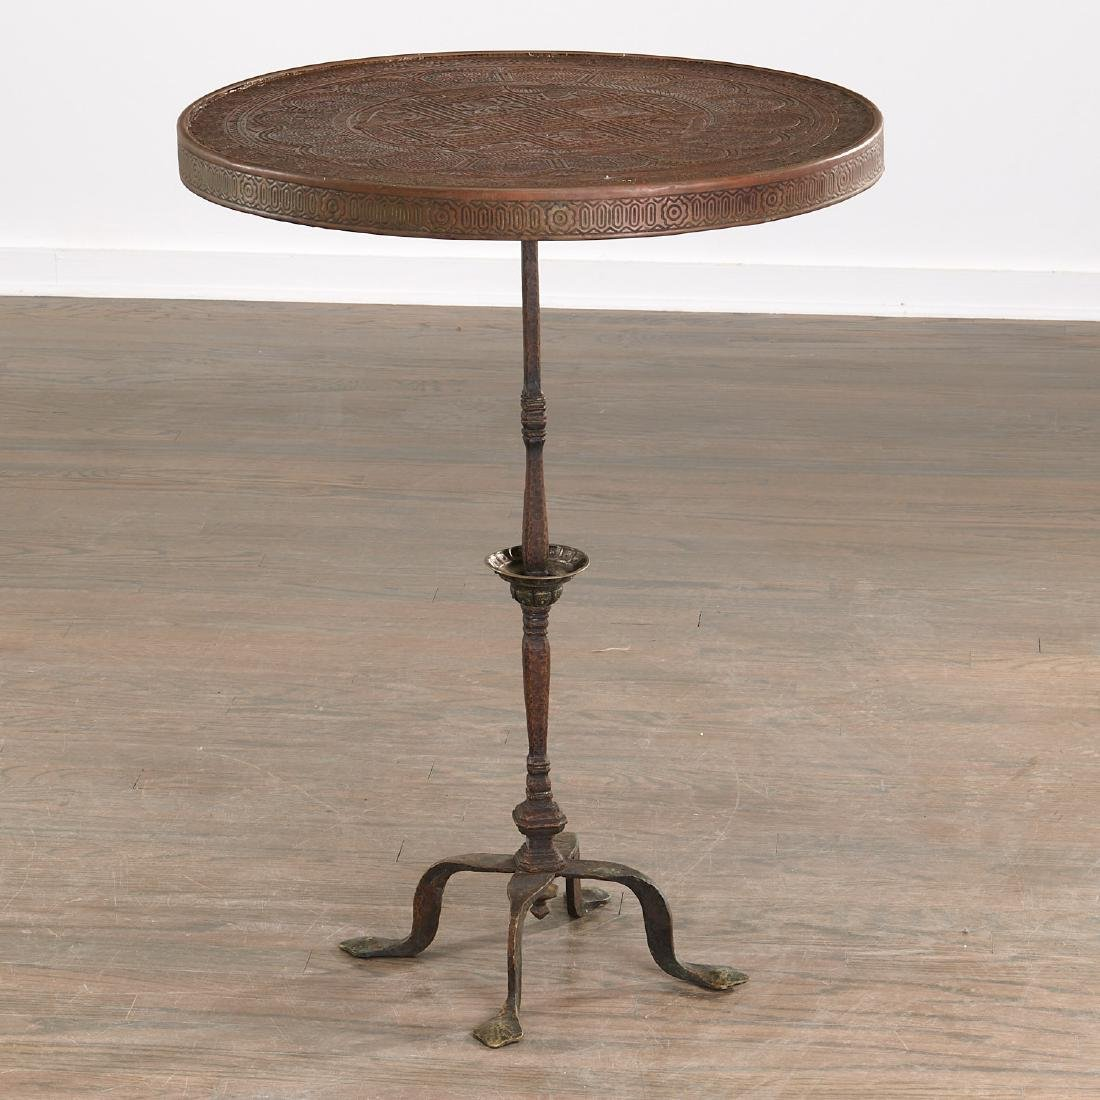 Aesthetic Movement Moorish decorated table